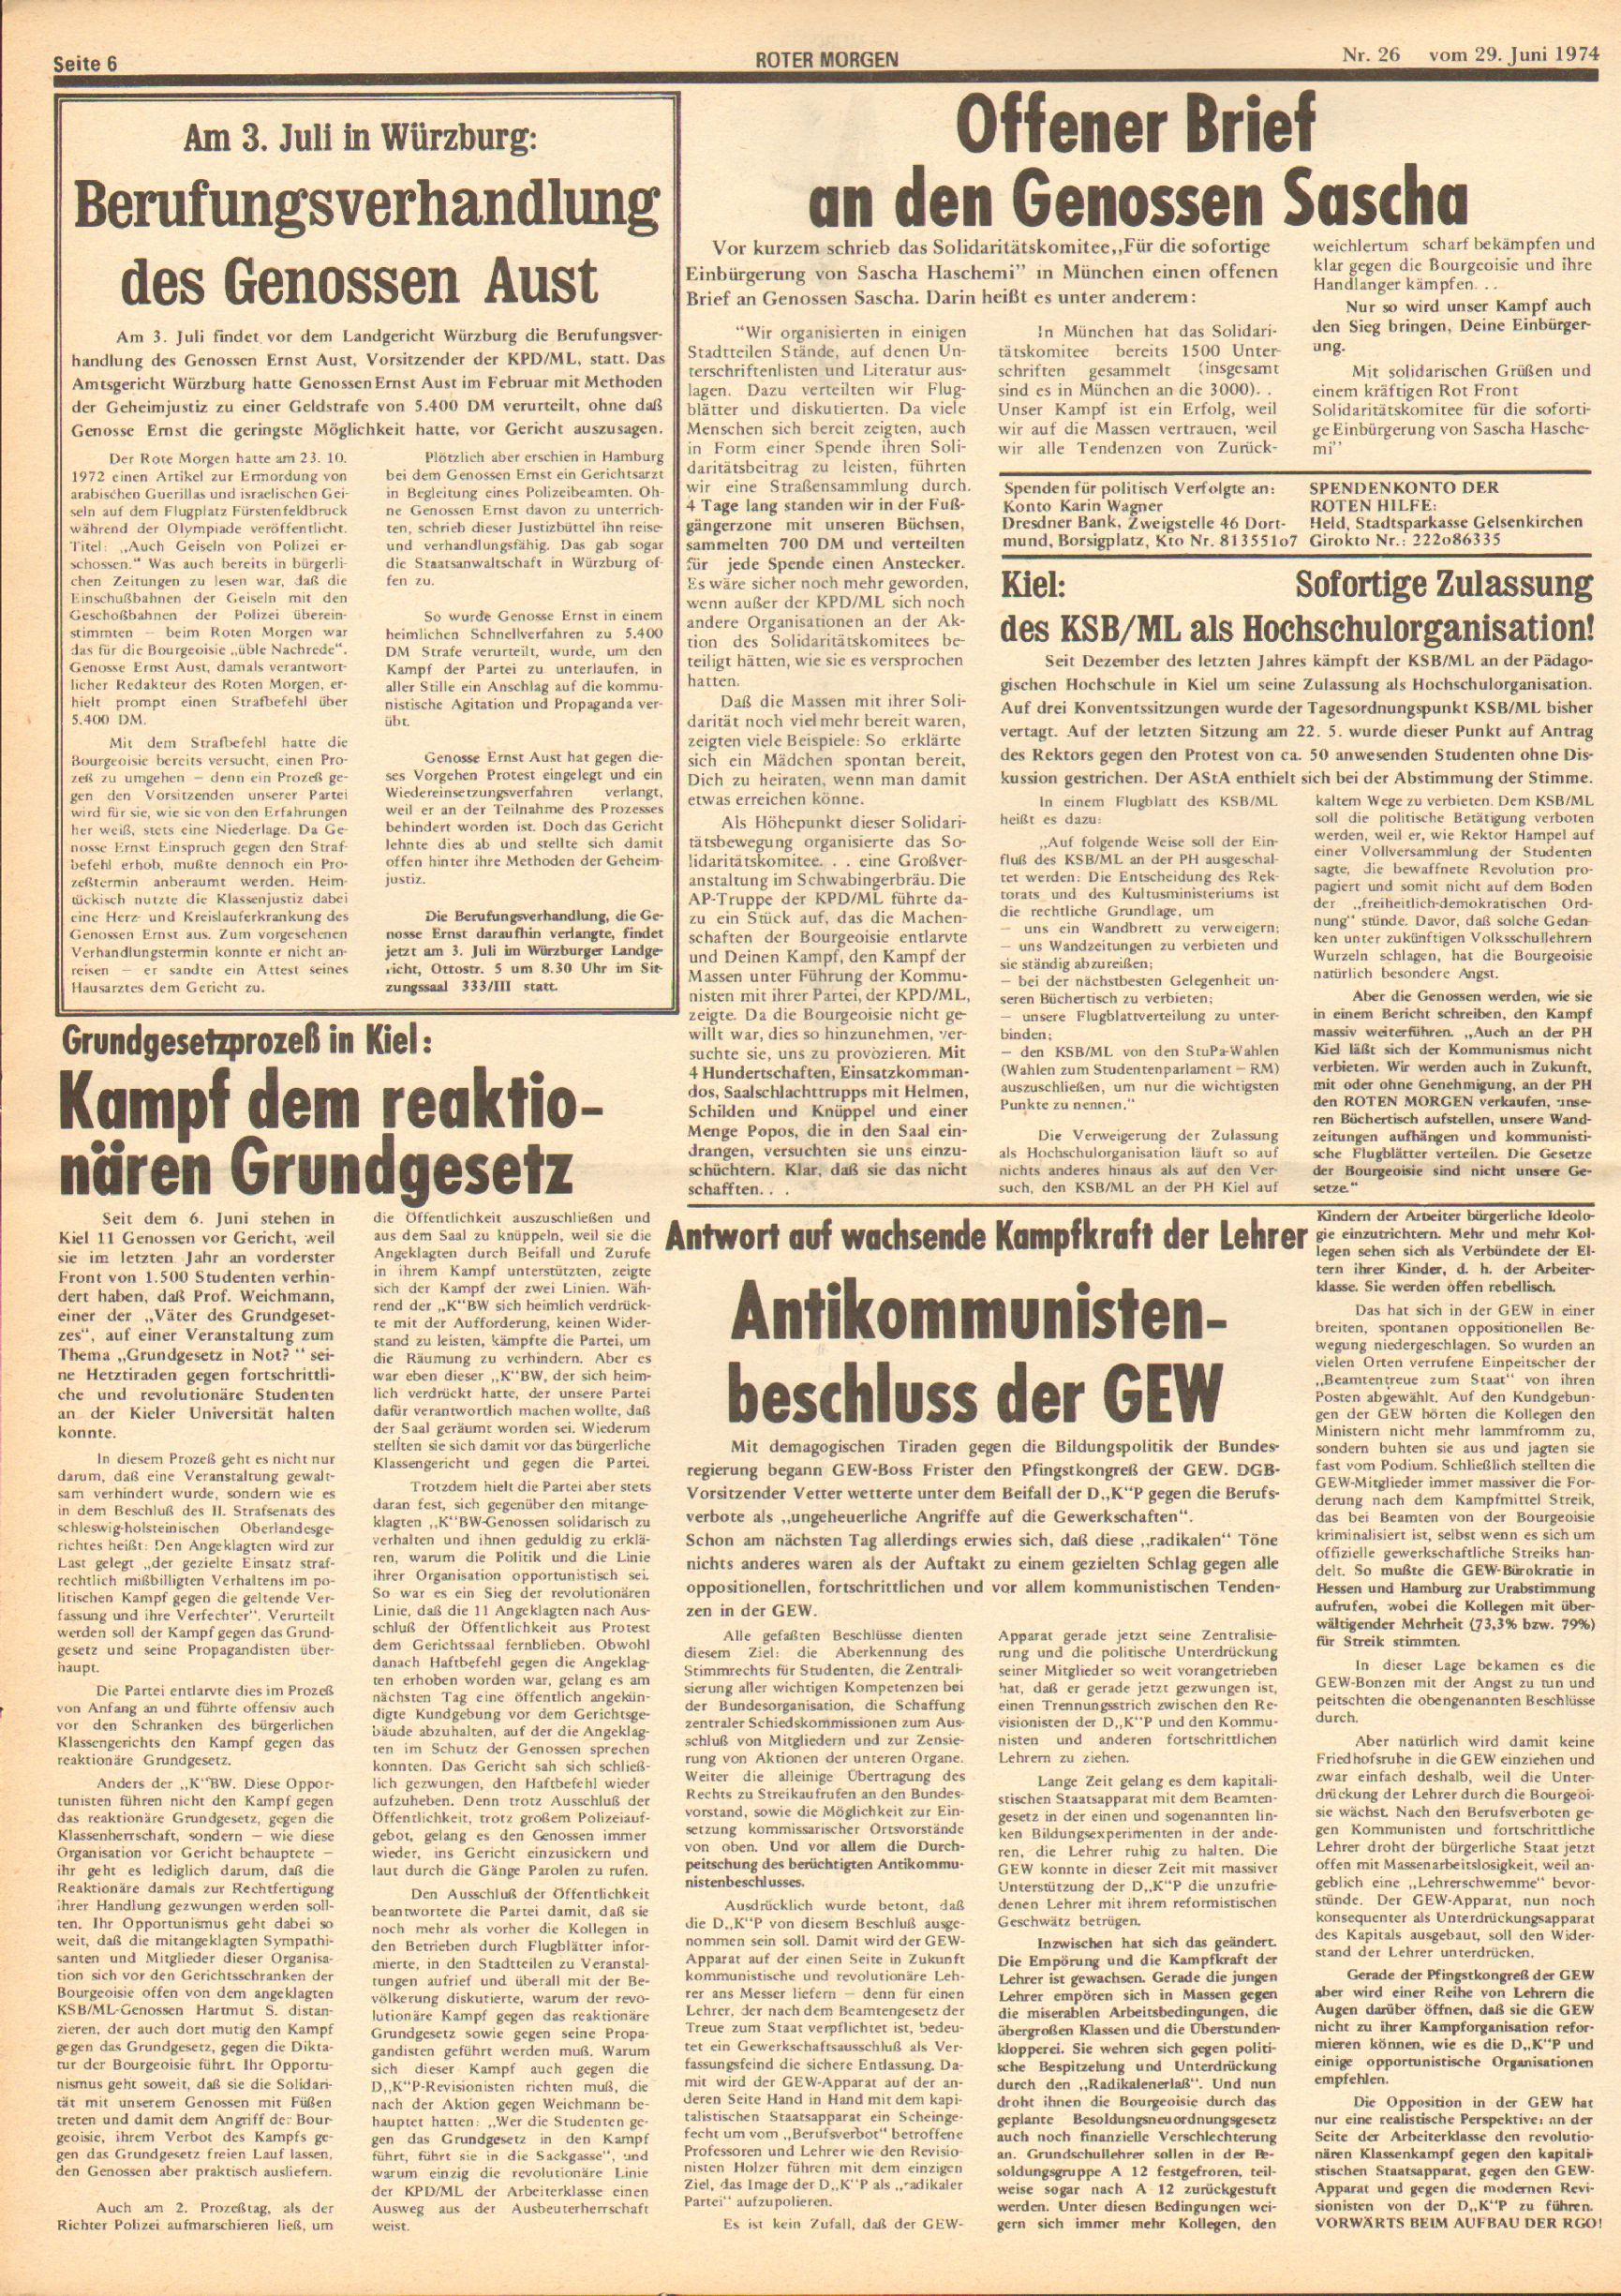 Roter Morgen, 8. Jg., 29. Juni 1974, Nr. 26, Seite 6